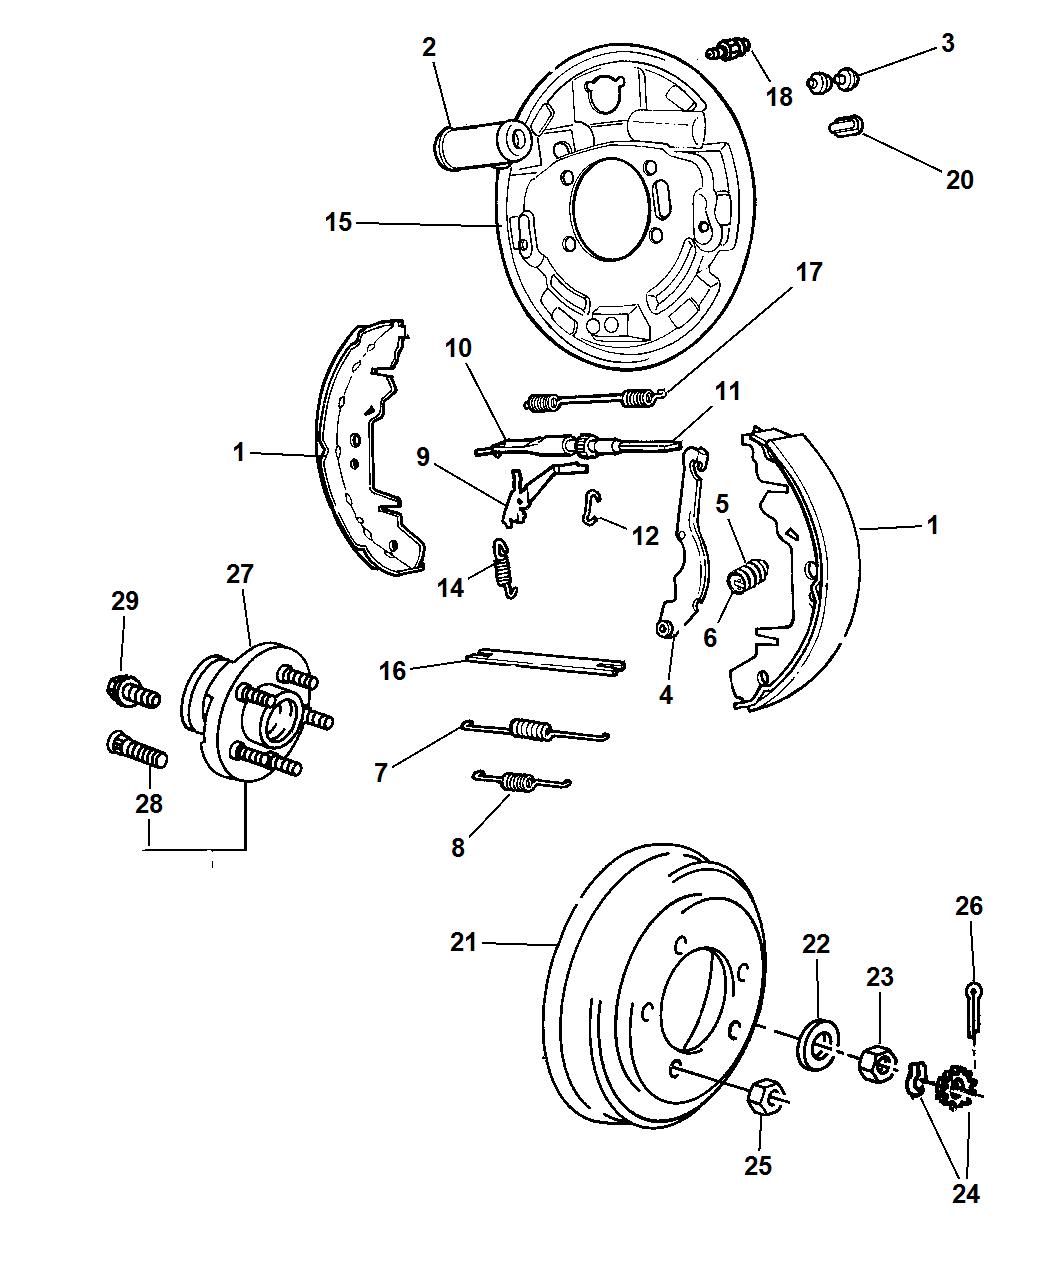 Dodge Caravan Brake Diagram Wiring Diagrams Auto Fat Found A Fat Found A Moskitofree It